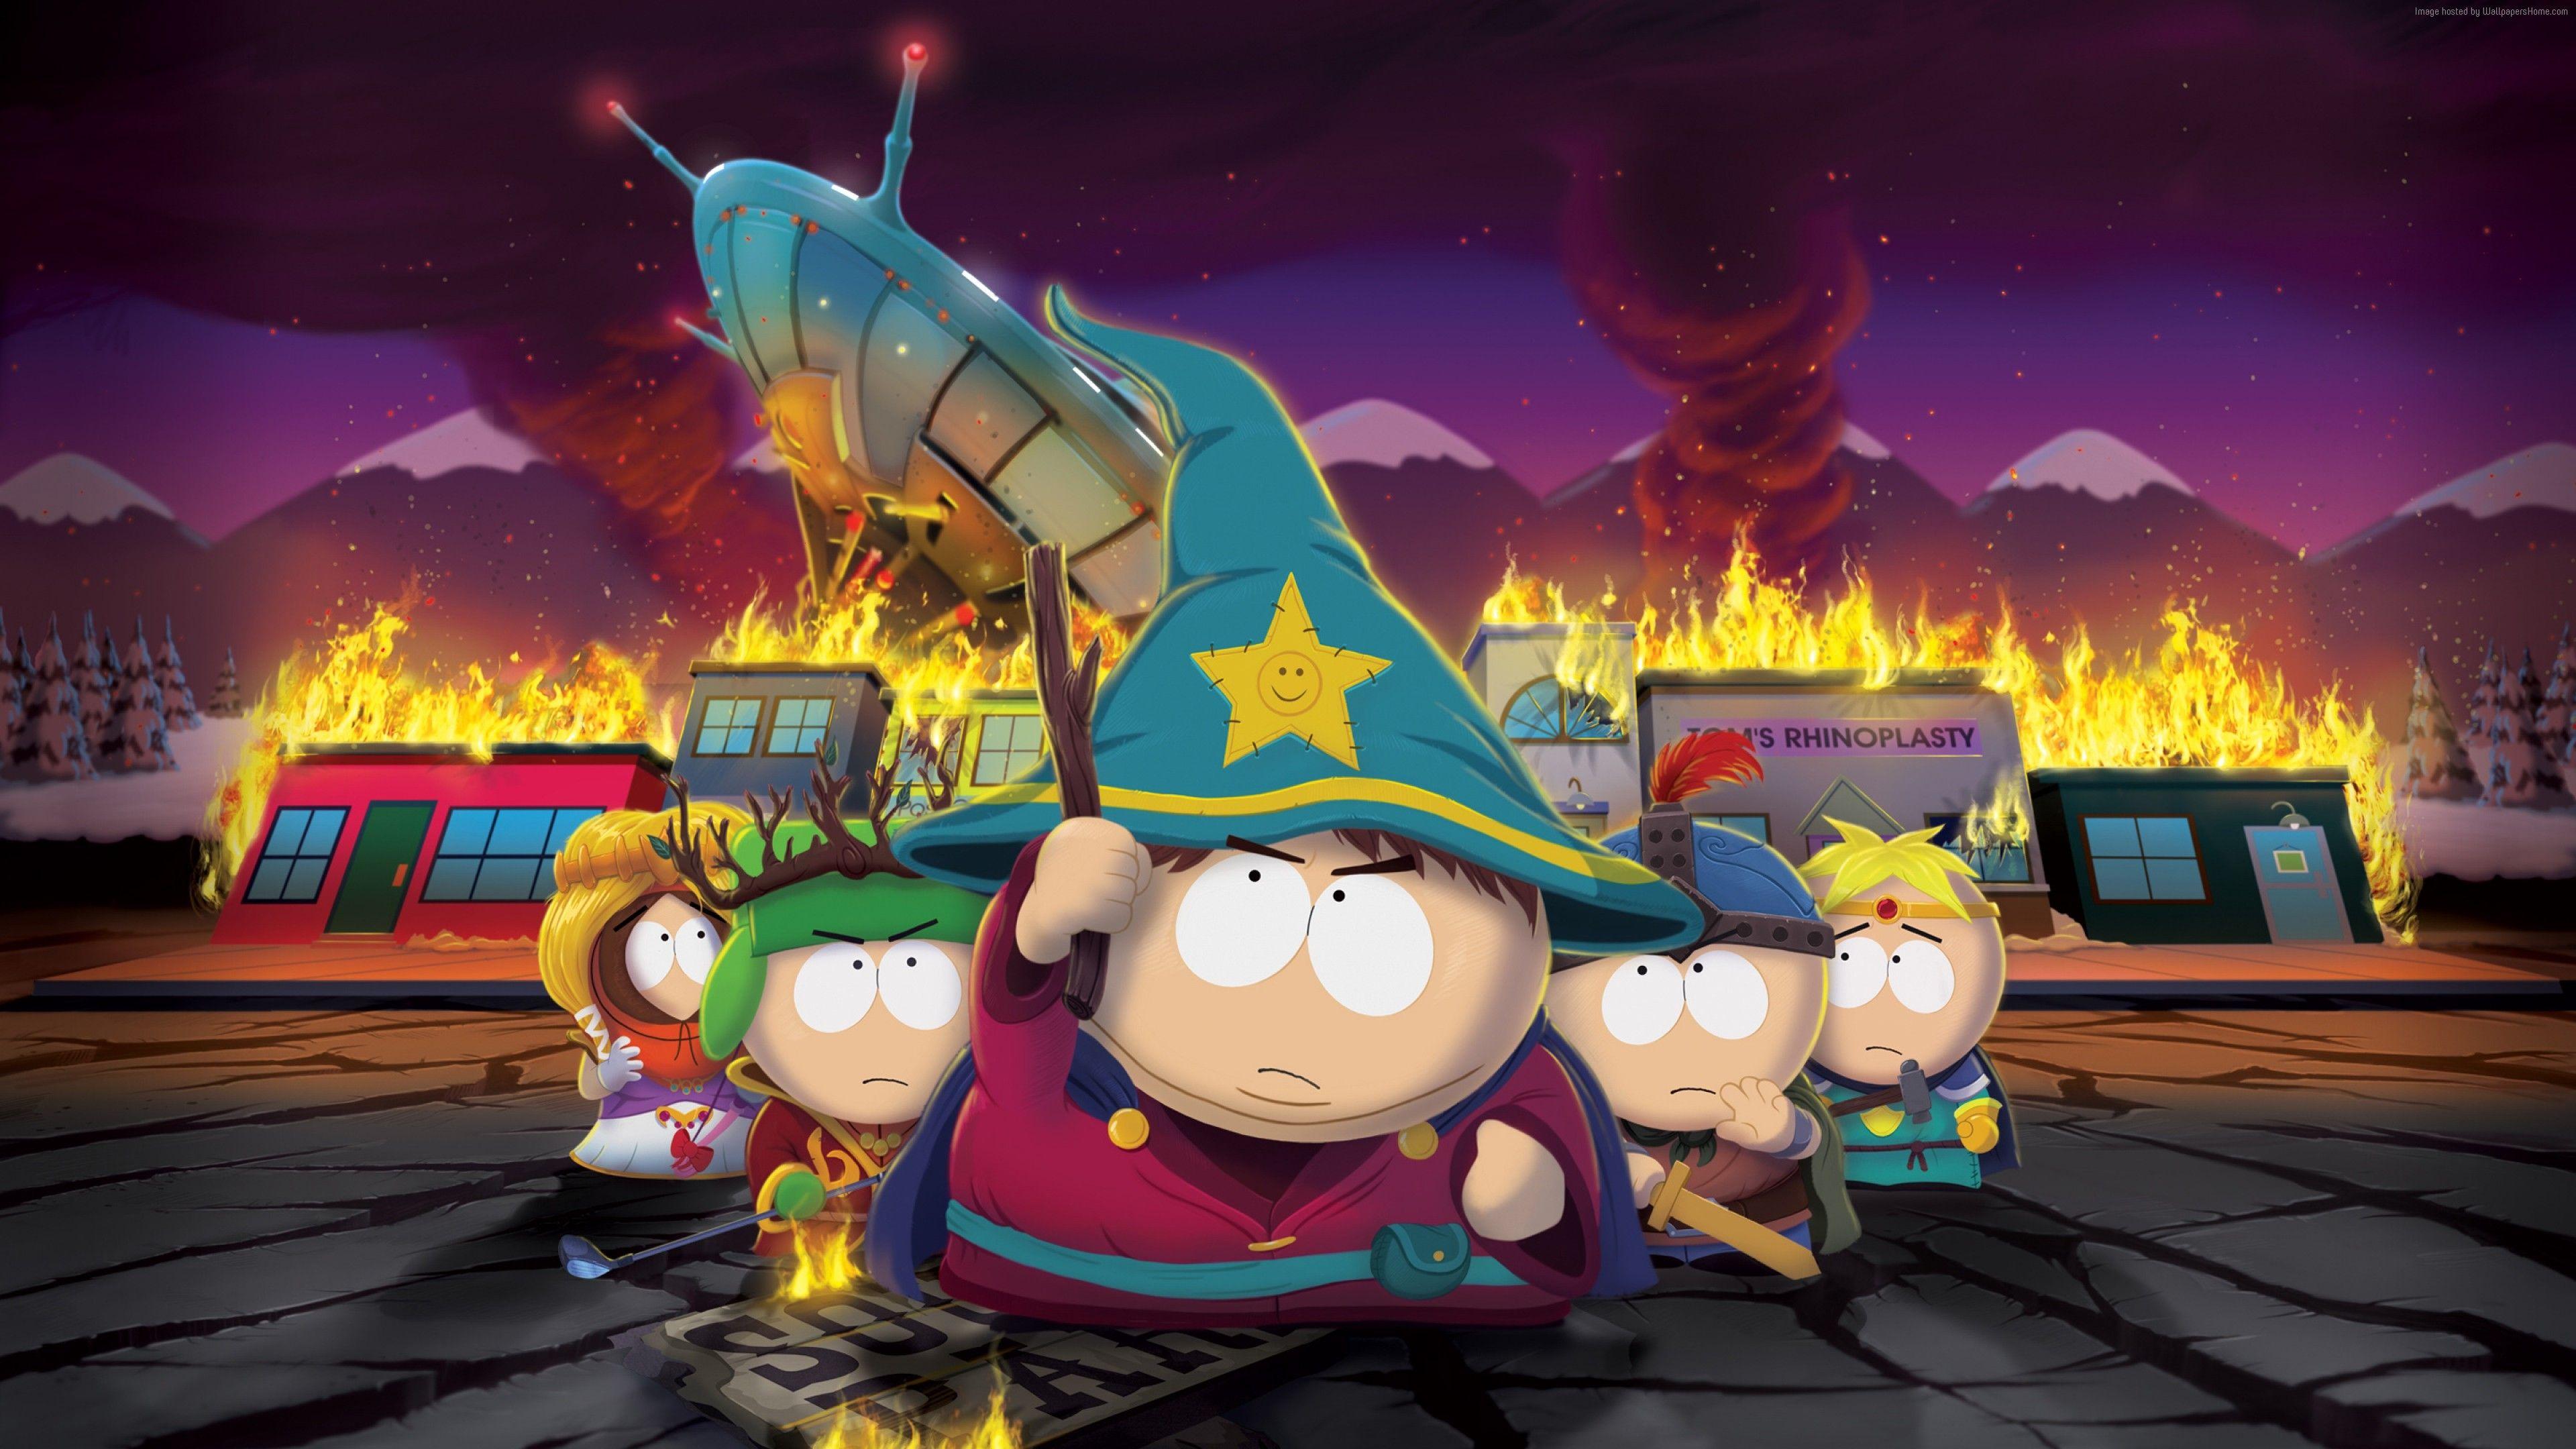 South Park 4k, HD Cartoons, 4k Wallpapers, Images ...